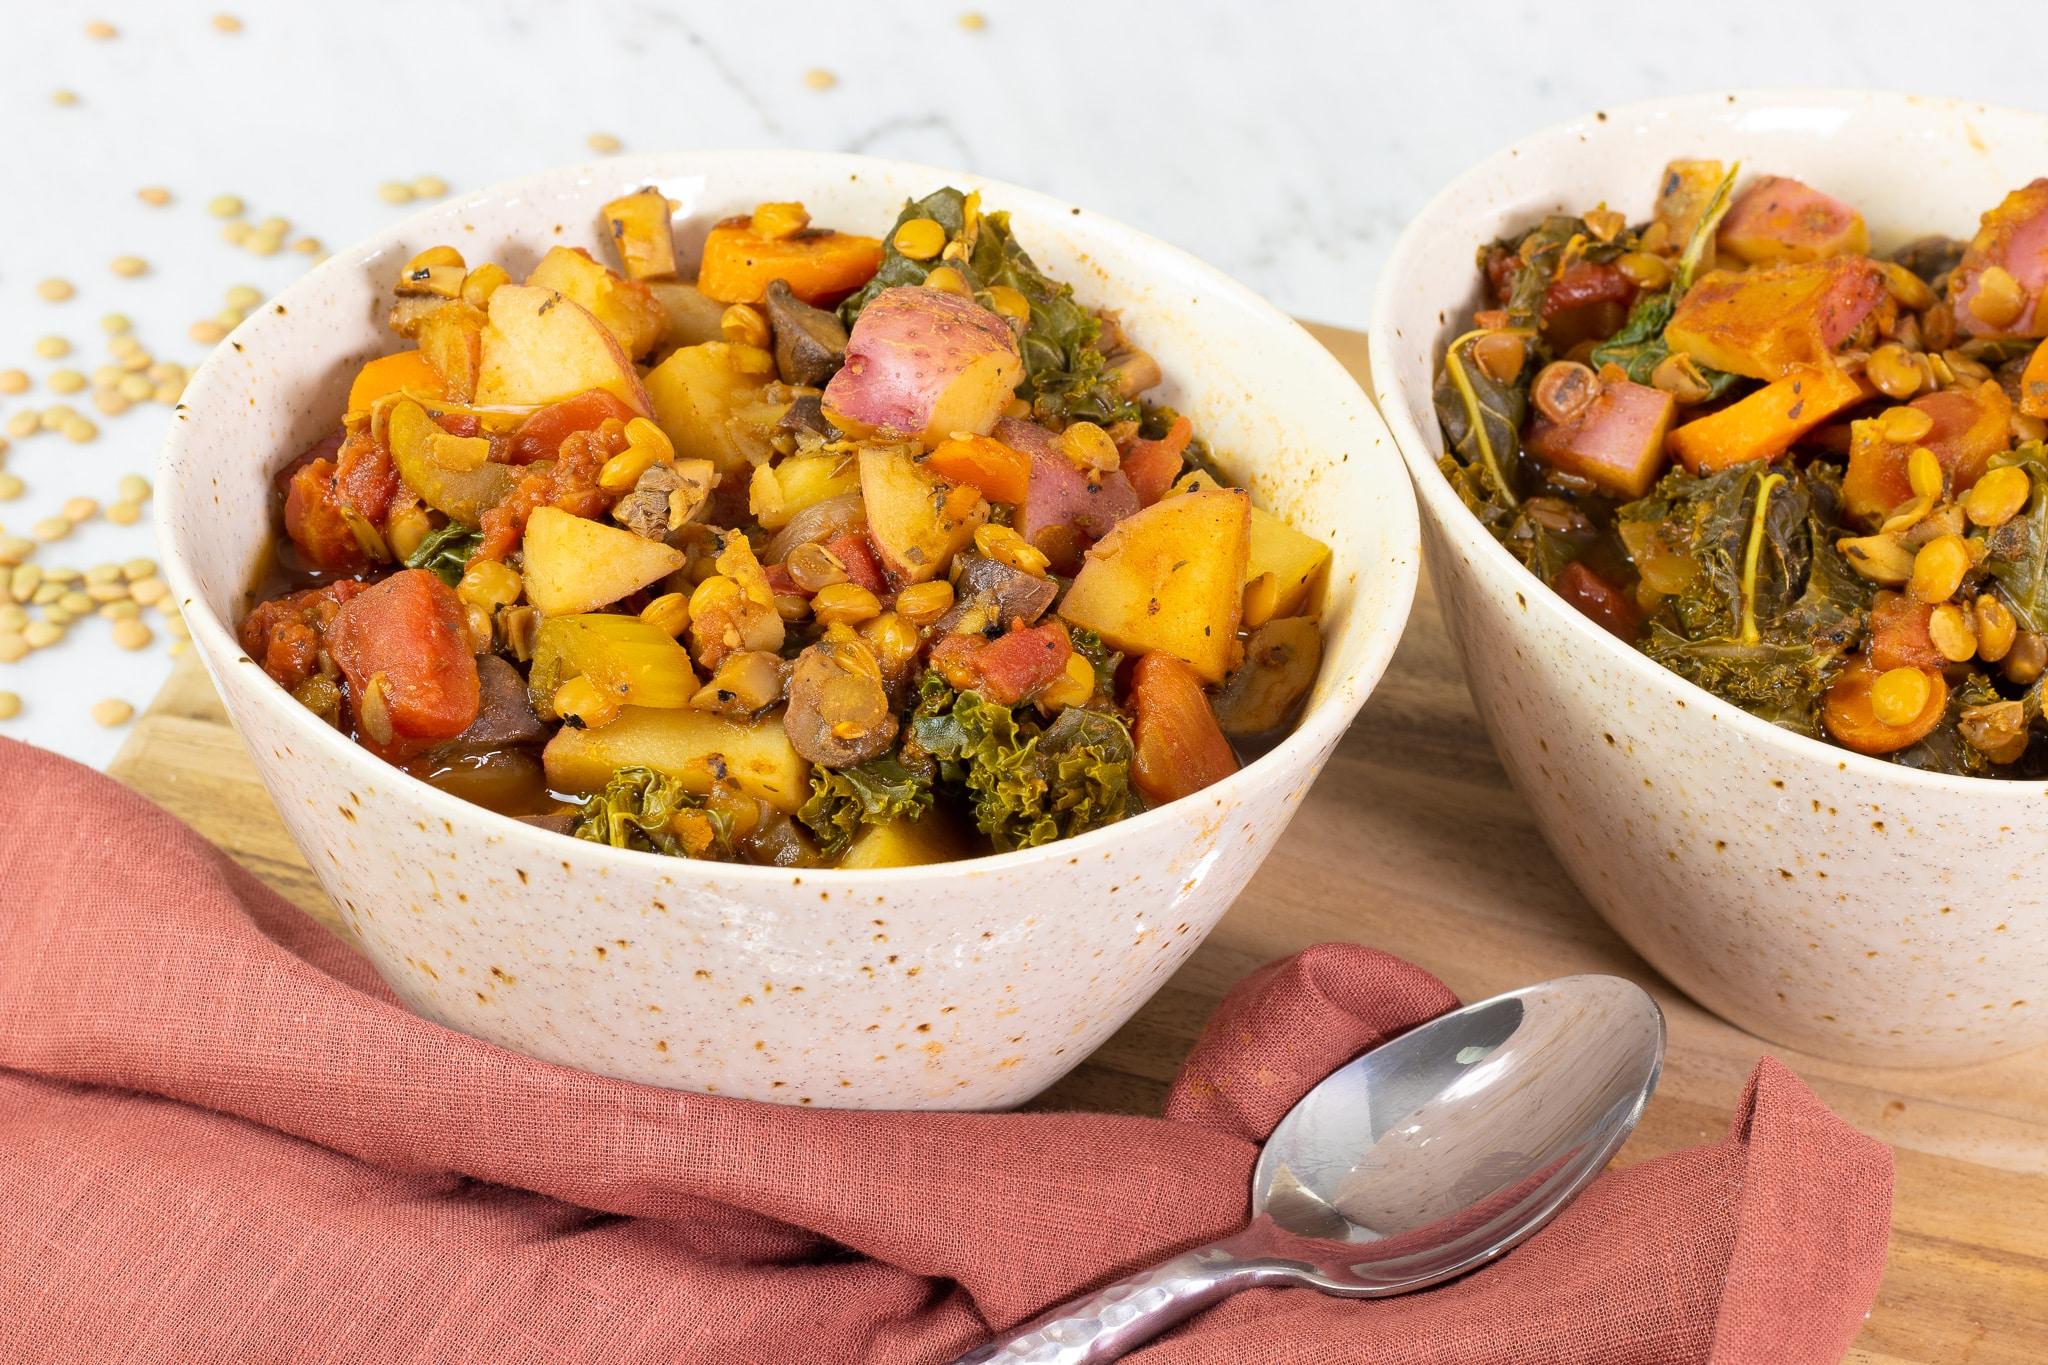 Hearty Lentil Vegetable Potato Stew